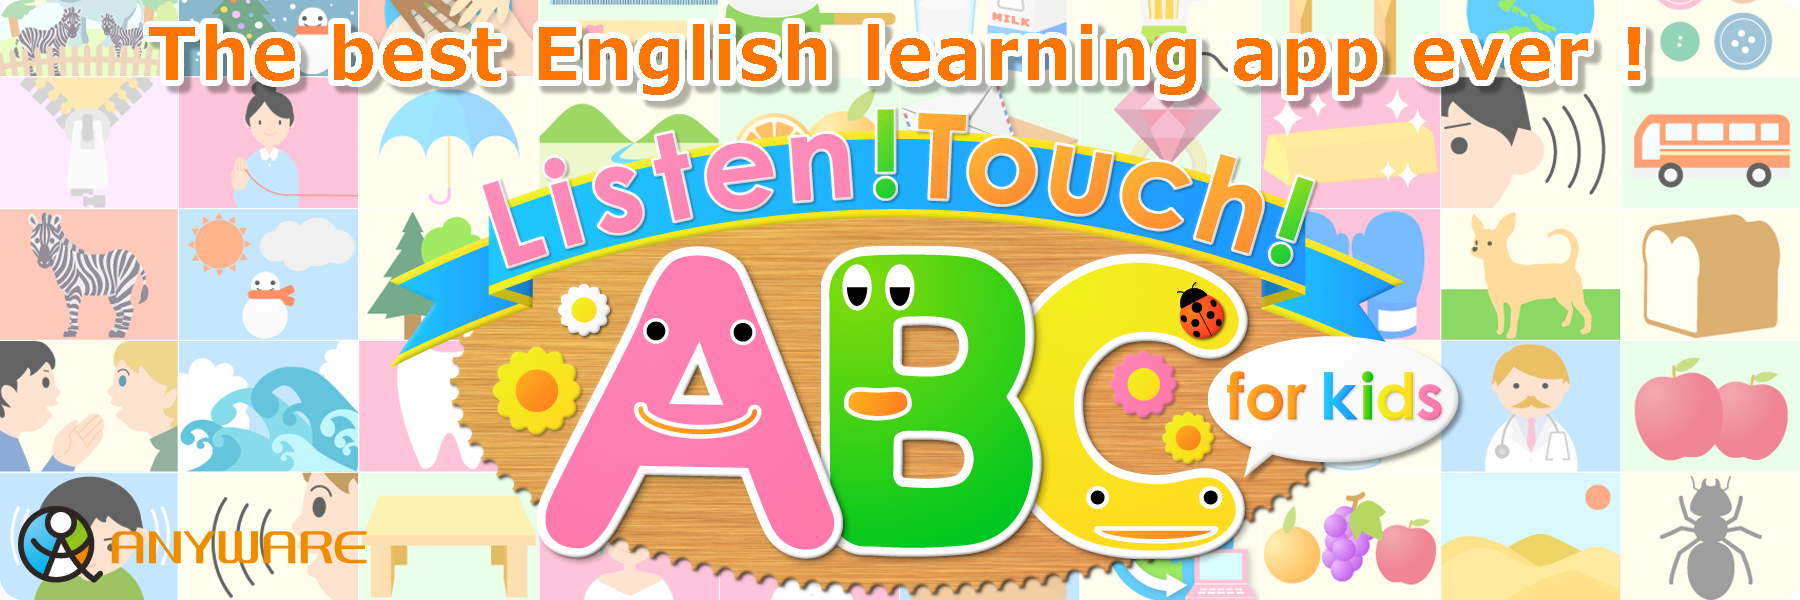 ABCwebバナー英語